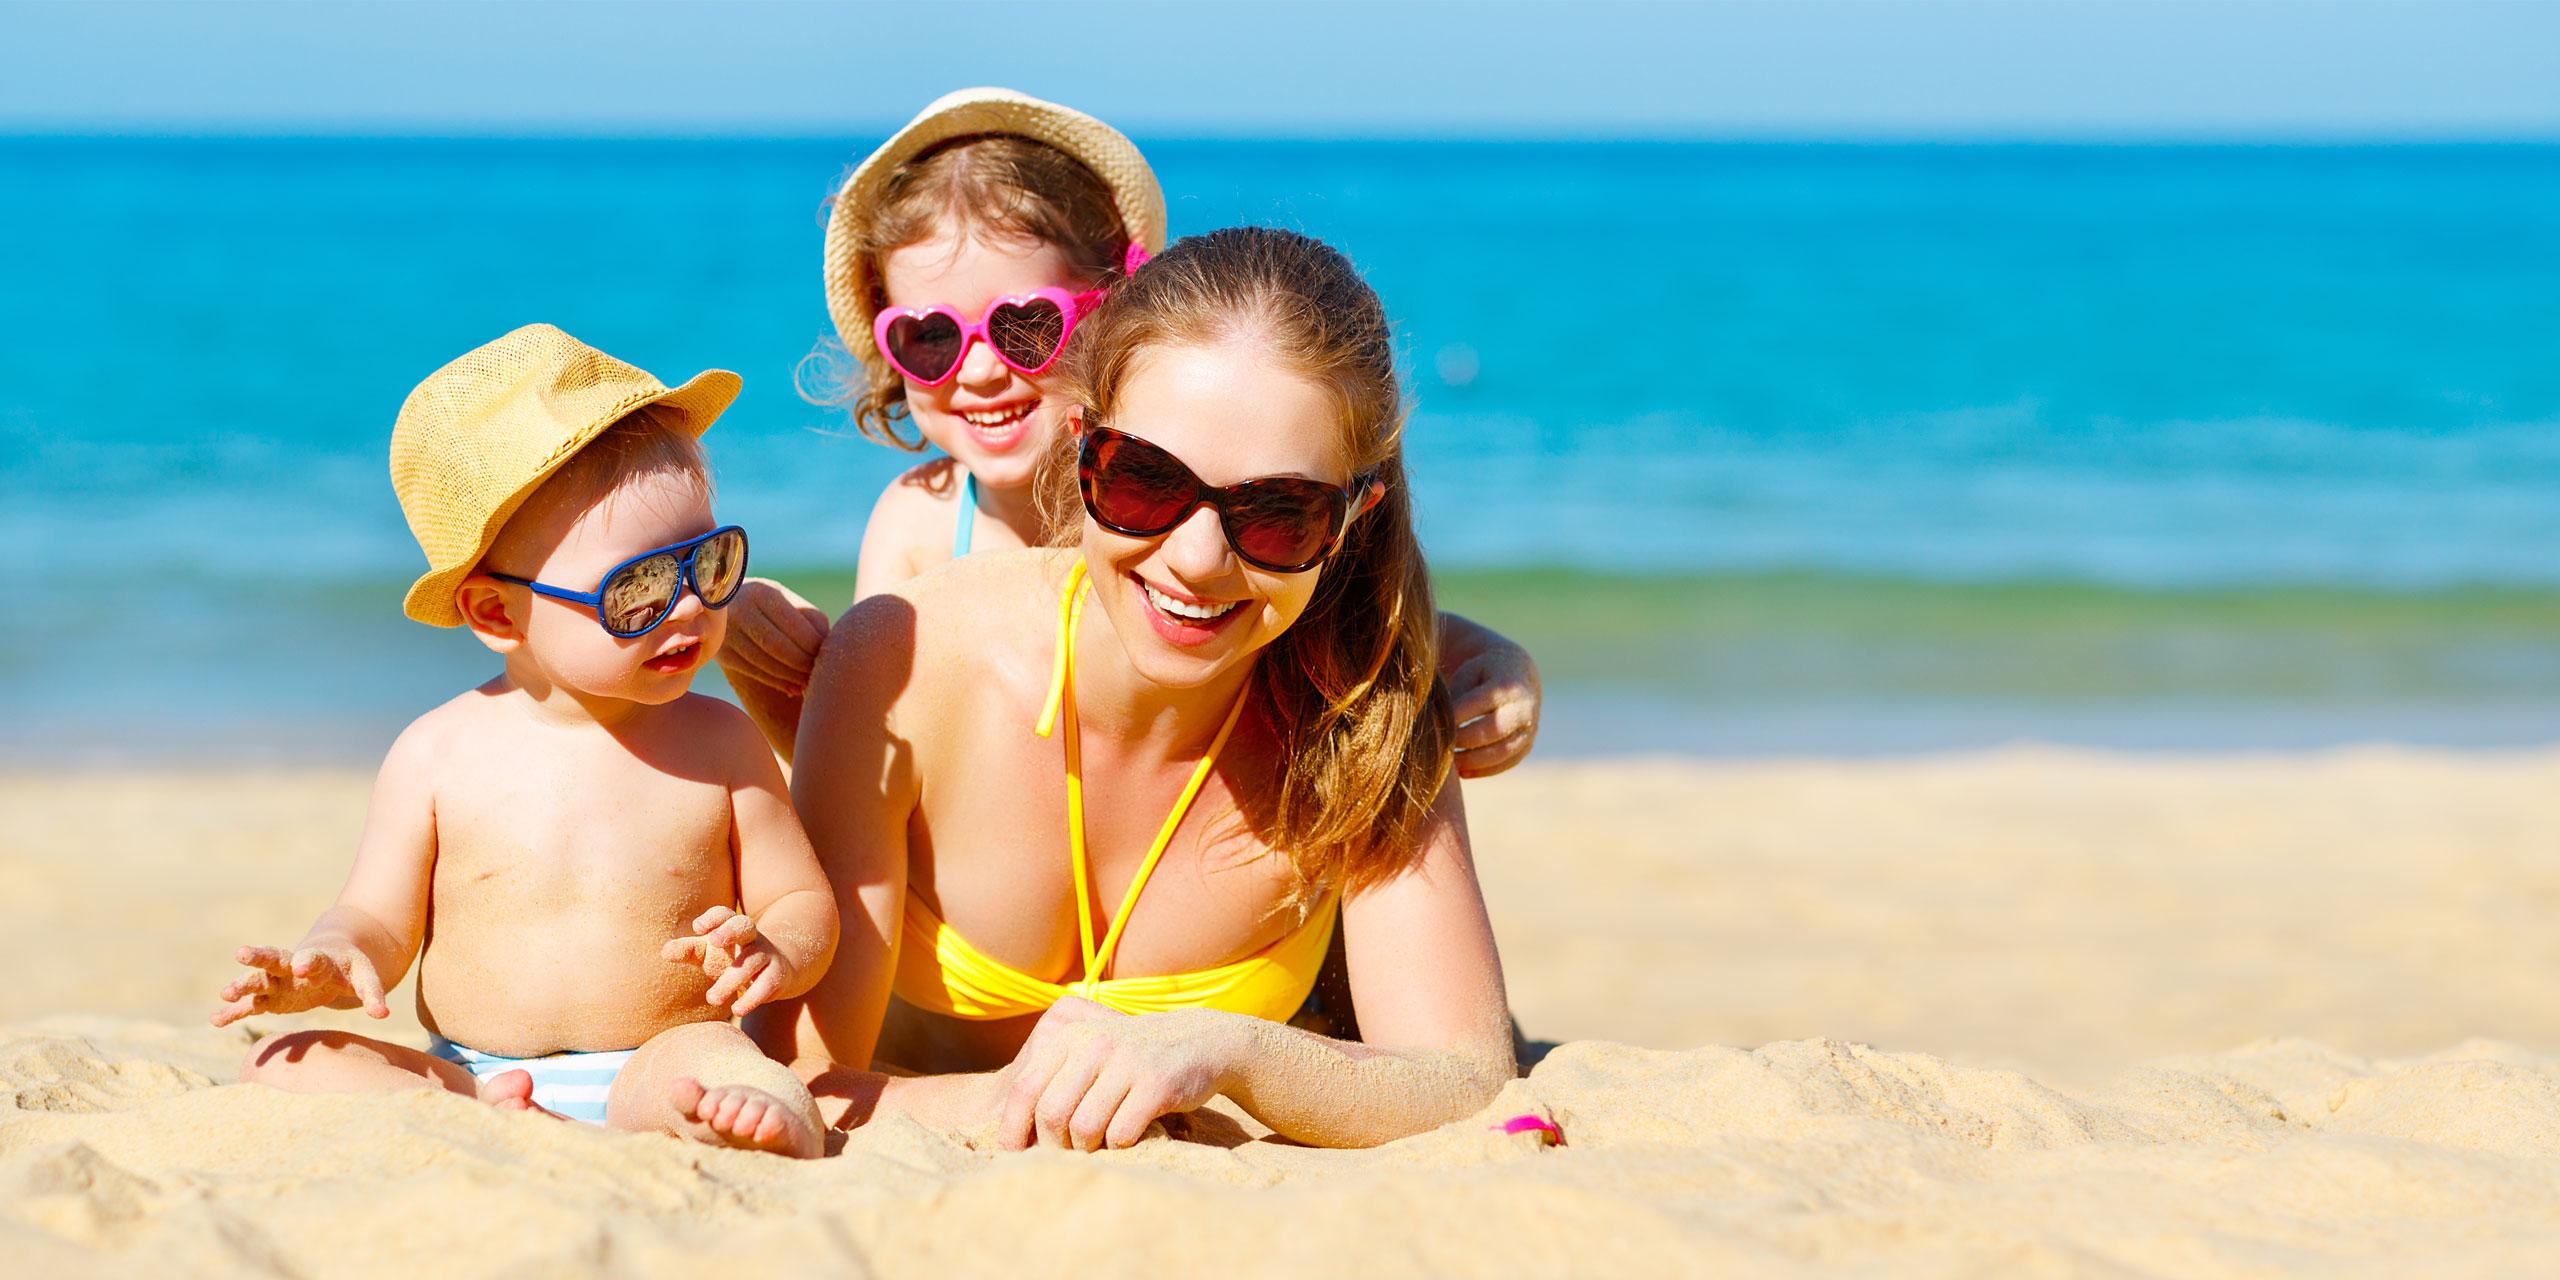 Mom and Kids on the Beach; Courtesy of Evgeny Atamanenko/Shutterstock.com